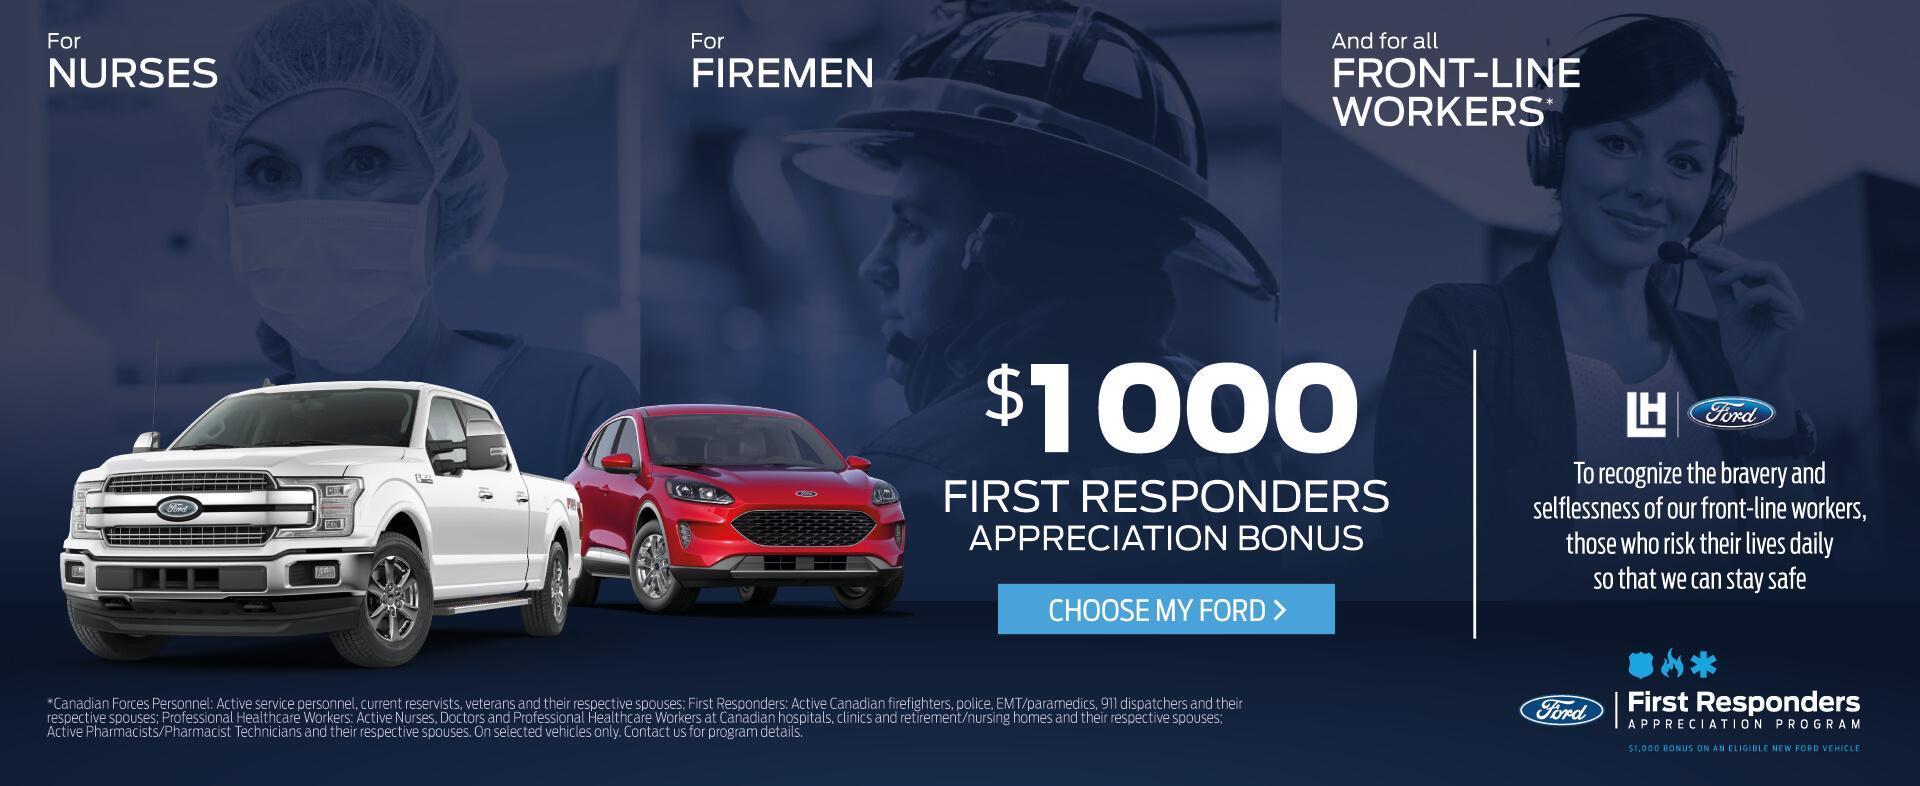 Ford Appreciation Program May 2020